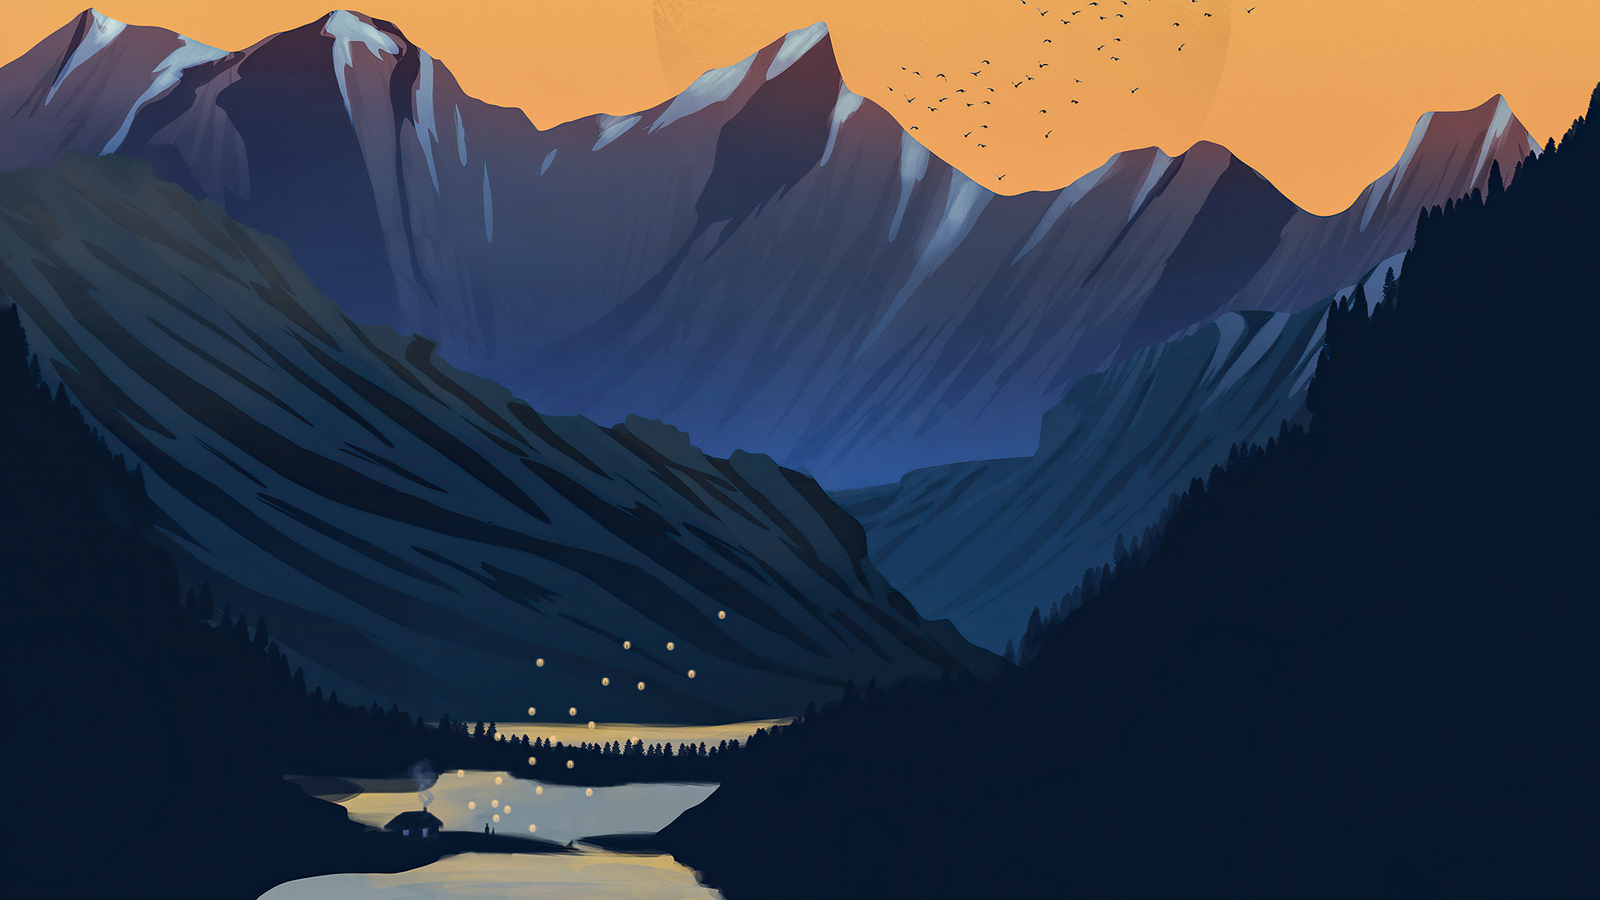 mountains-moon-lake-birds-4k-er.jpg